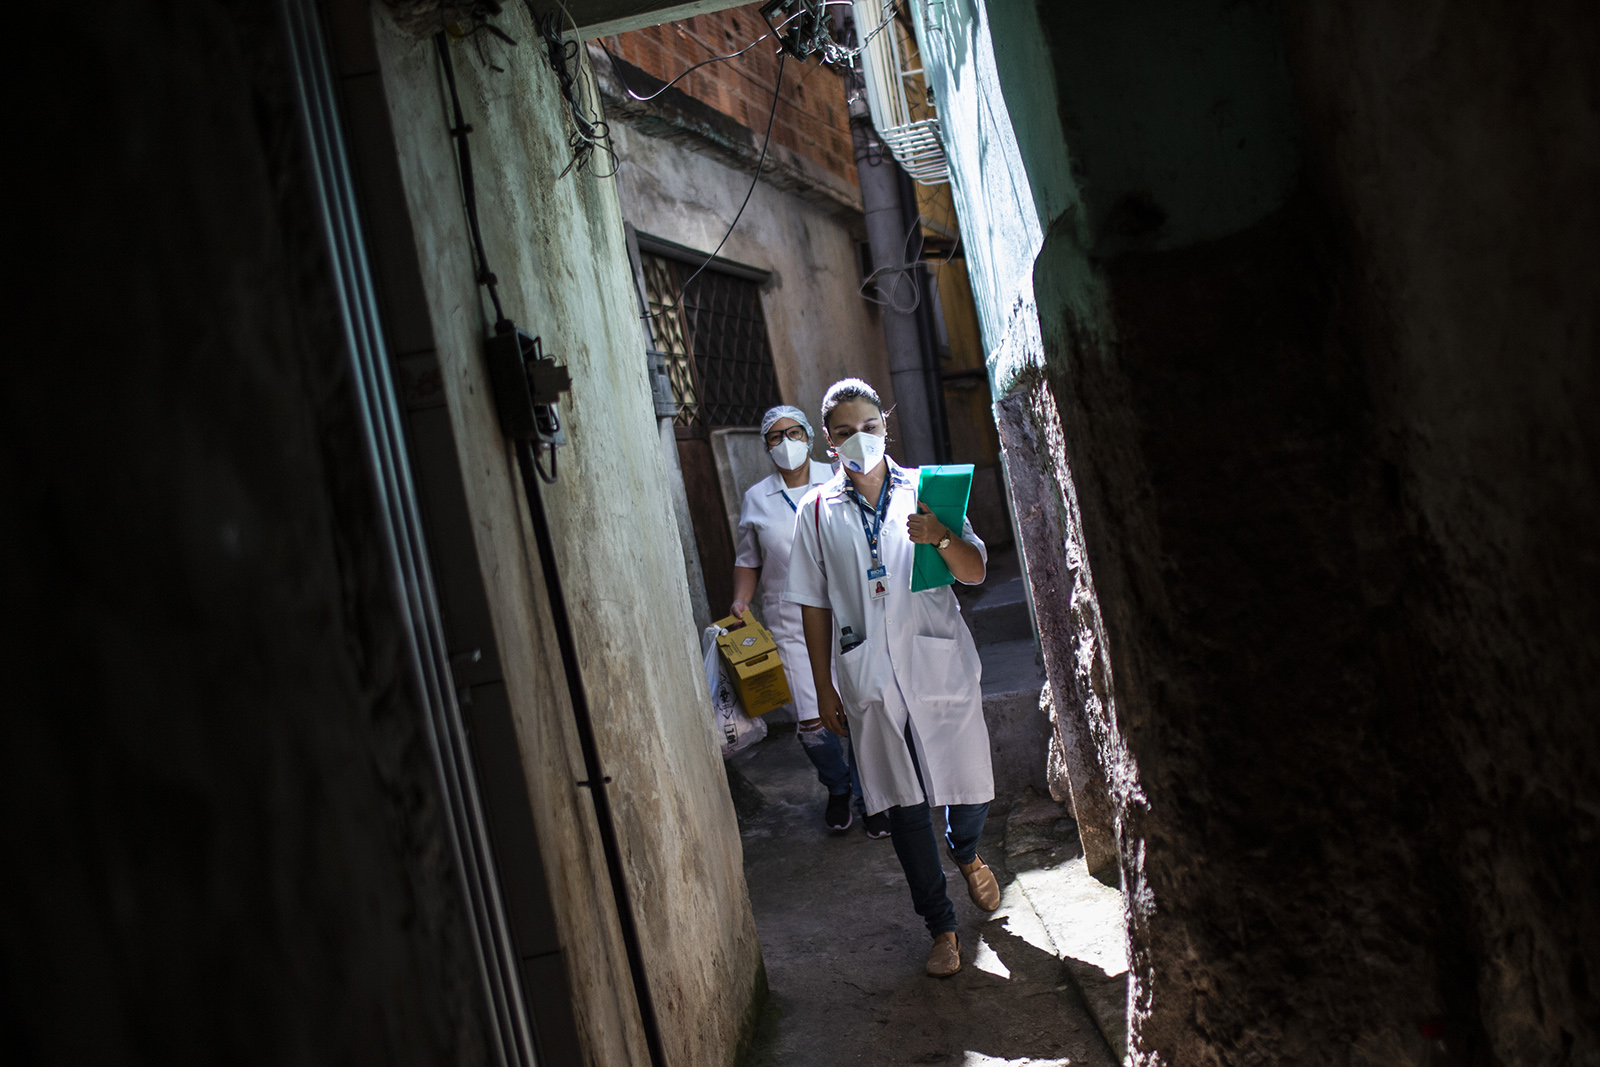 Health agents of the City of Rio de Janeiro walk in an alley of Favela da Mangueira on September 3.